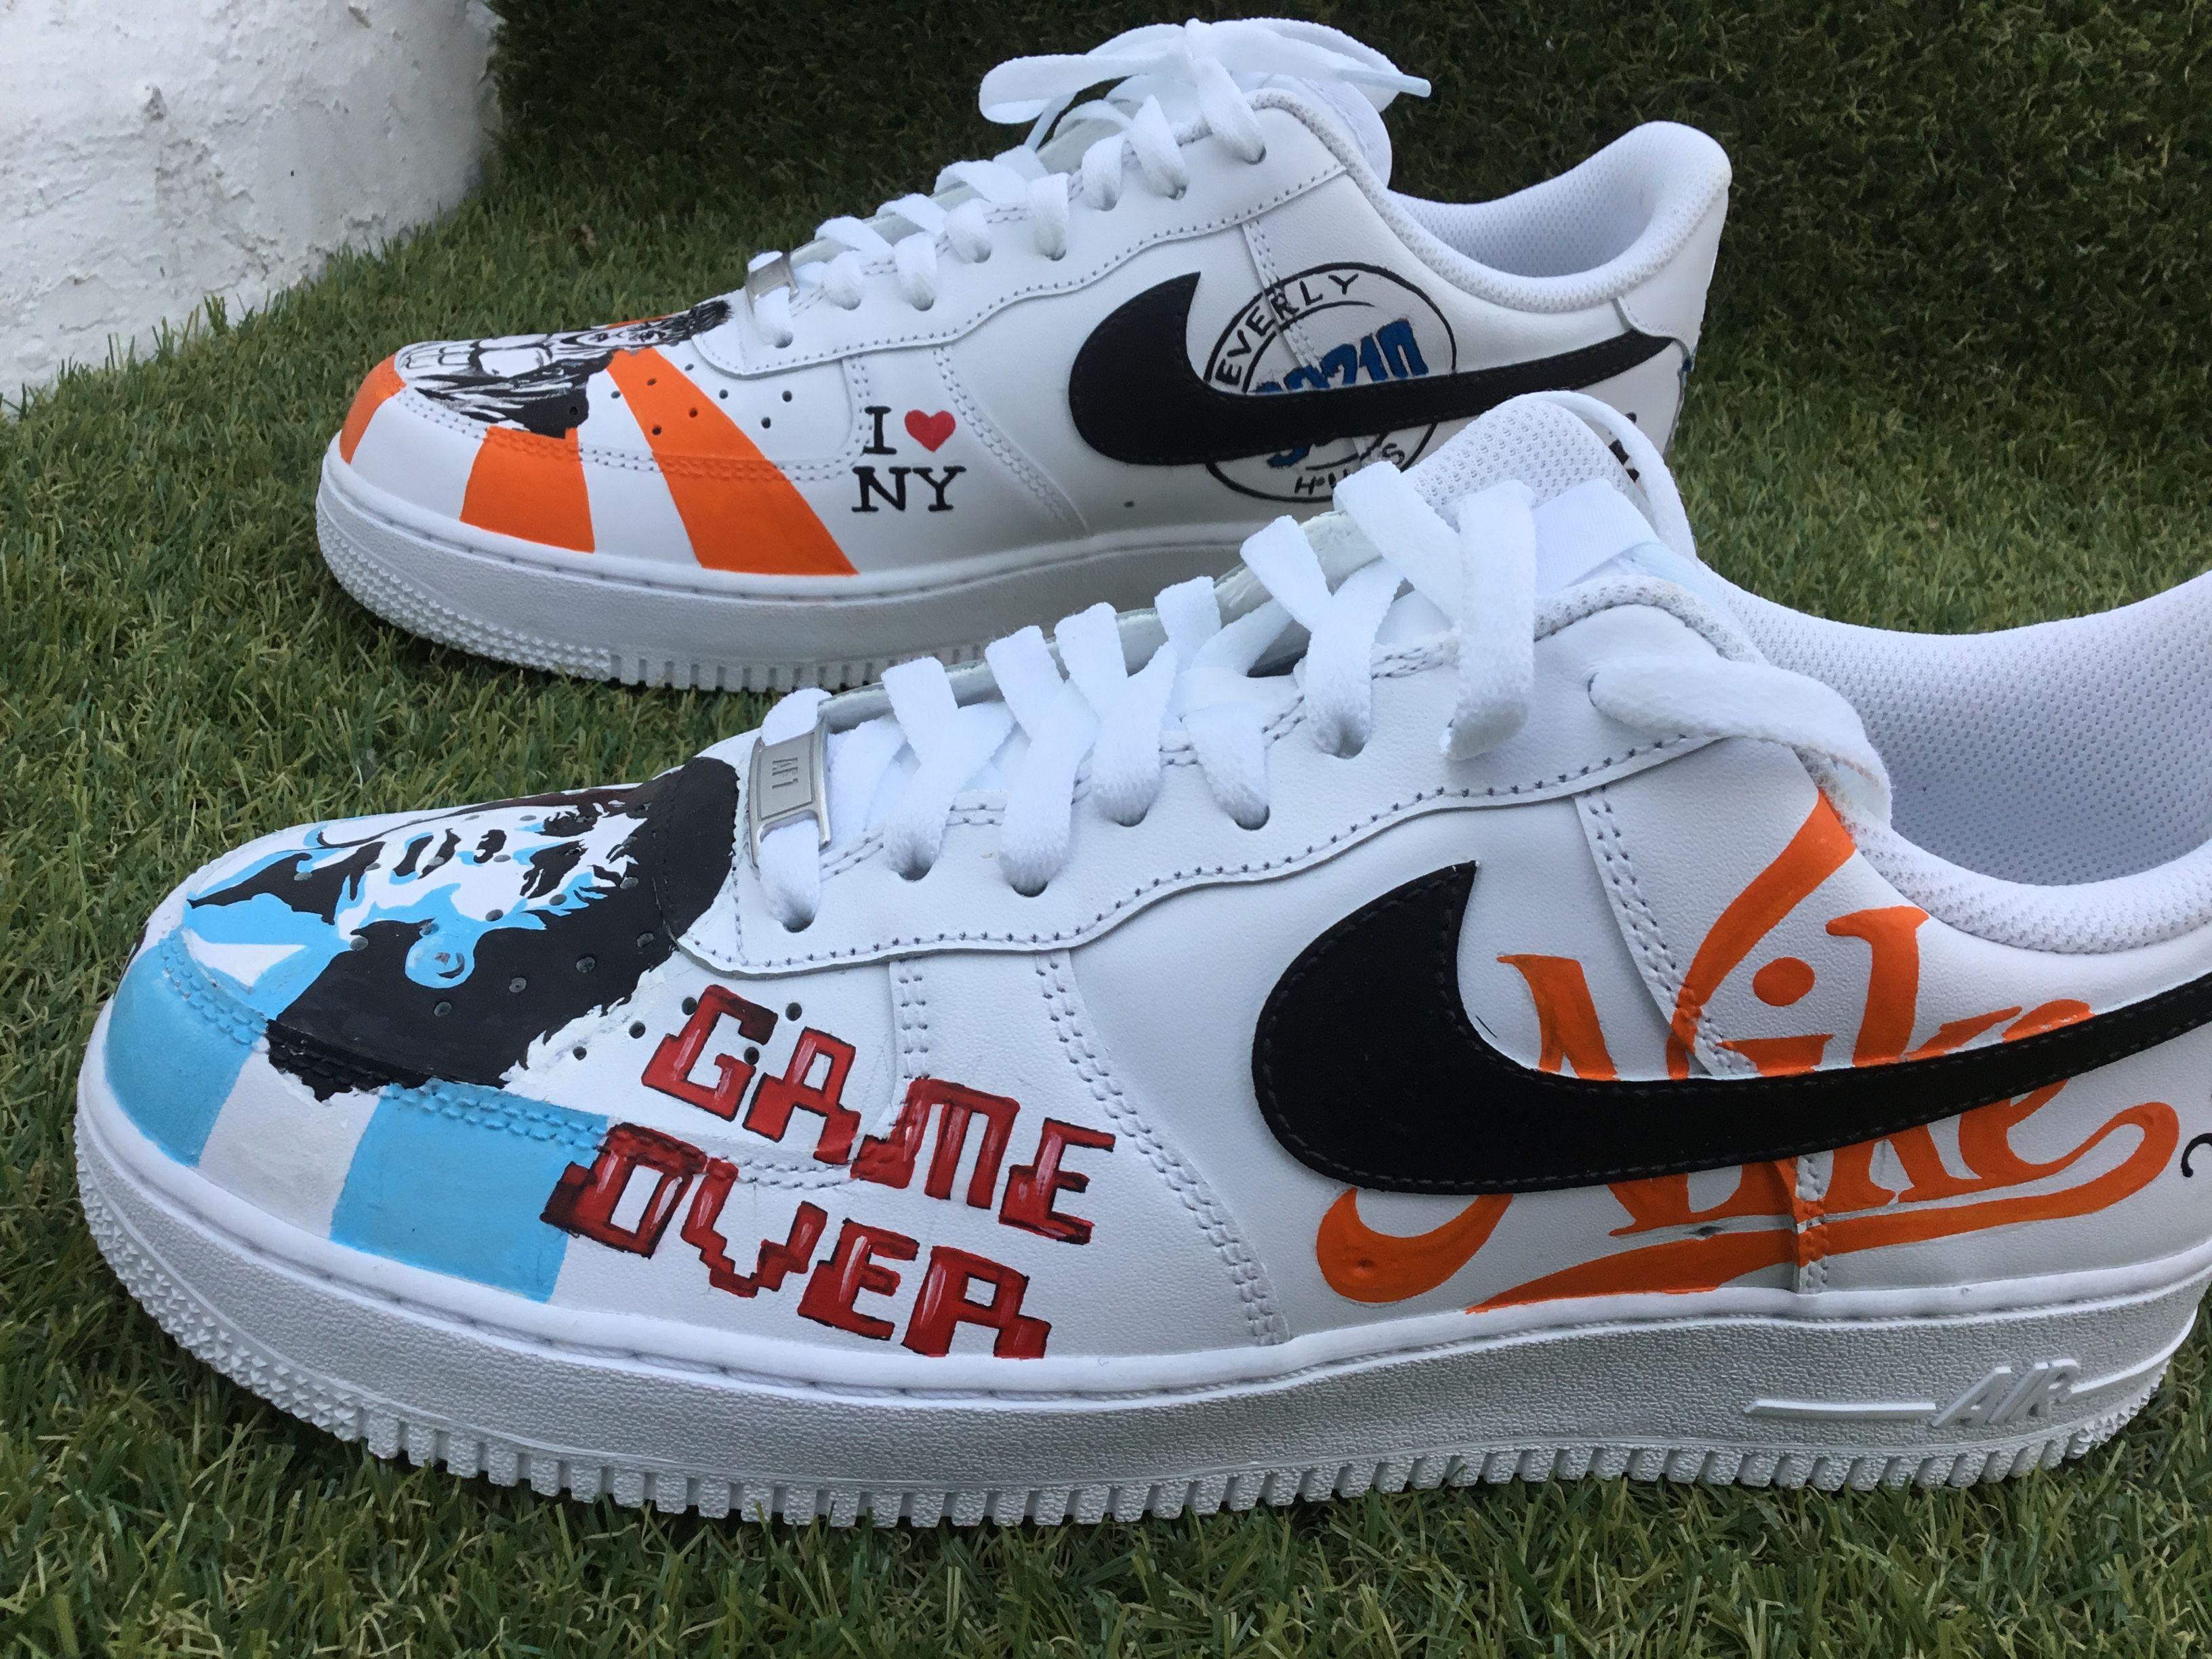 Custom painted Nike Air Force one sneakers by vmixo #vmixo